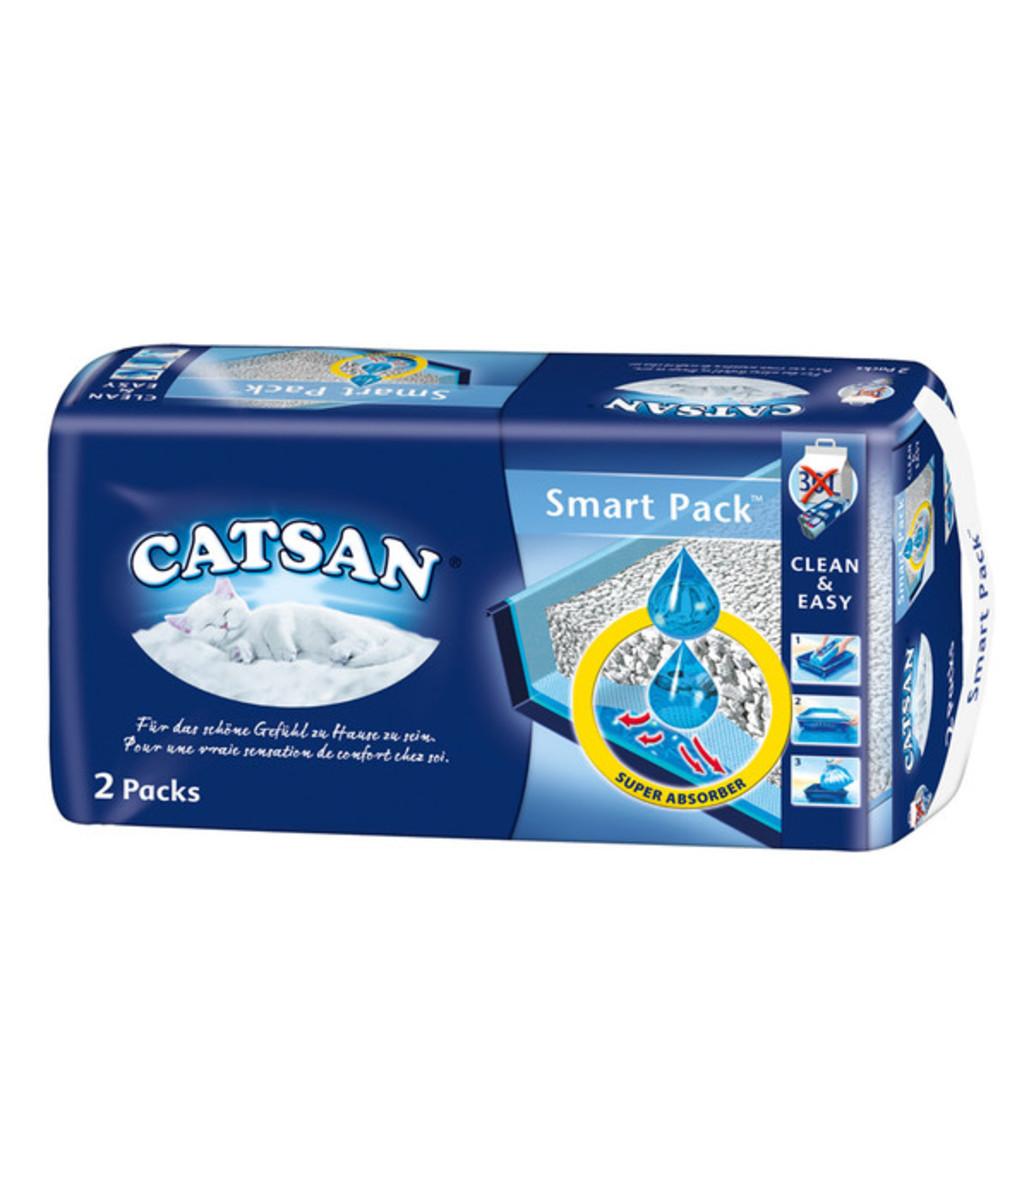 Bild 1 von Katzenstreu Catsan Smart Pack, 2 Stk.